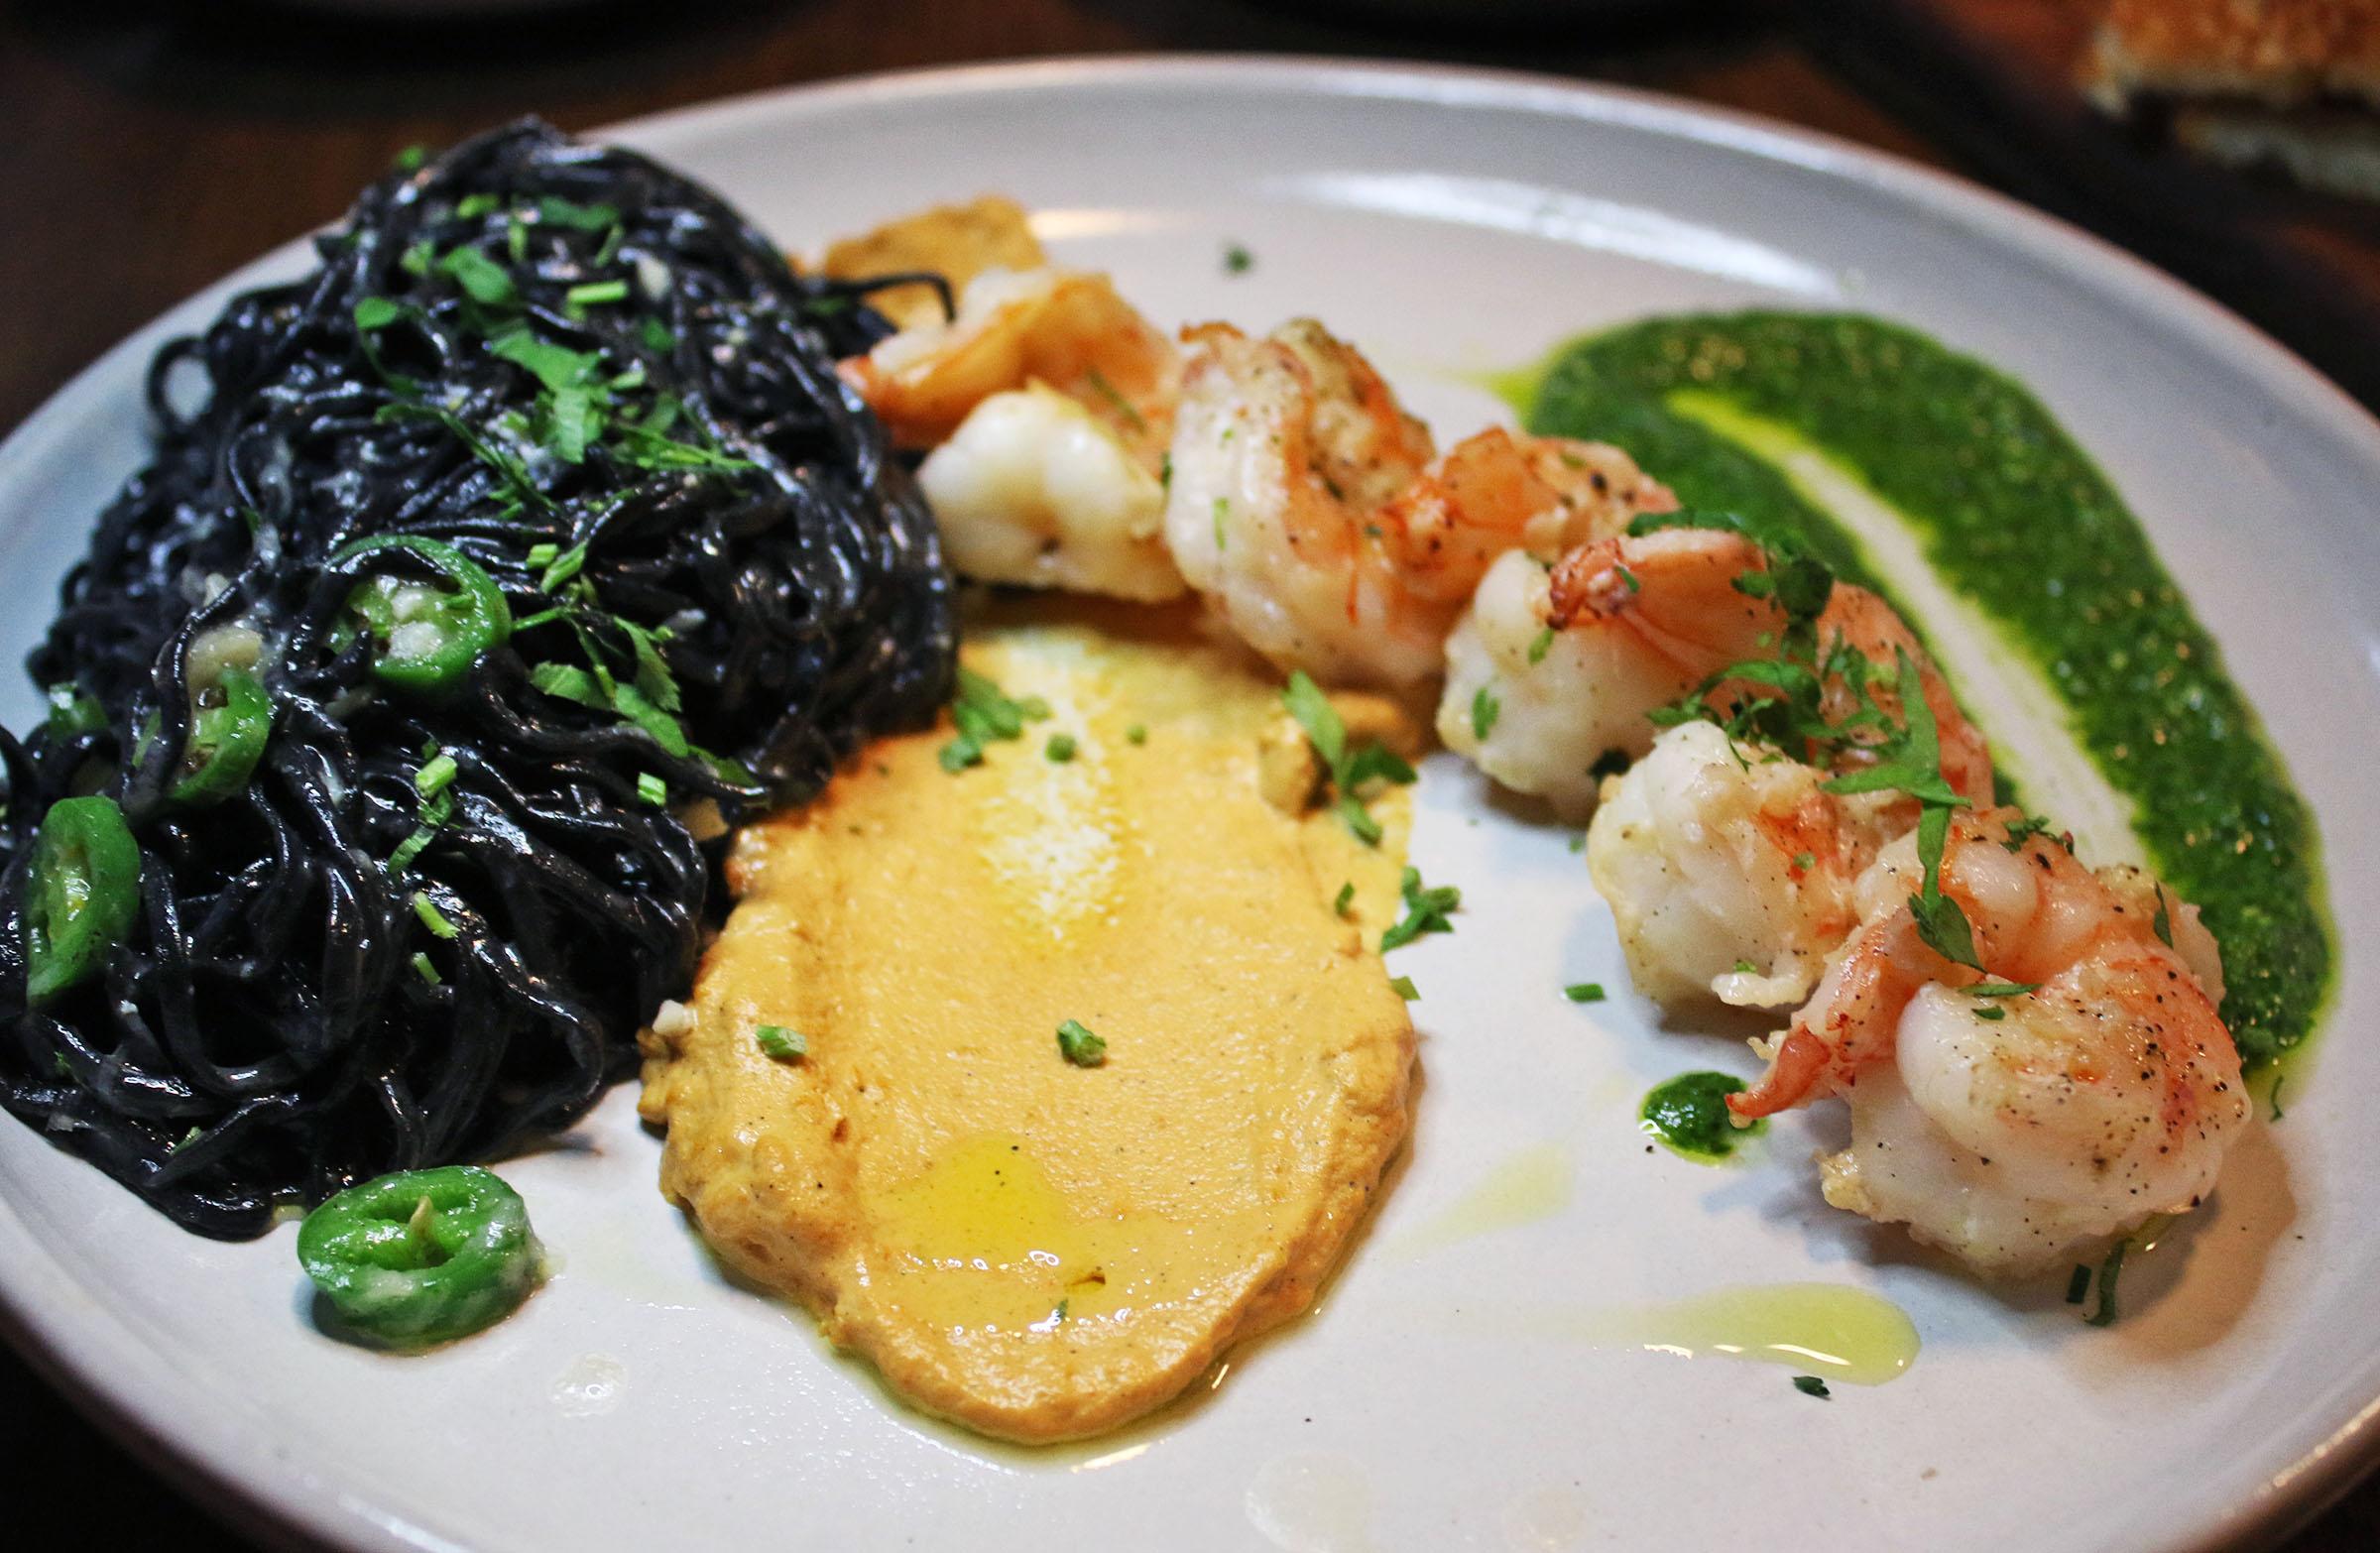 Squid Ink Spaghetti: Prawns, Romesco, Arugula Pesto and Serrano Peppers